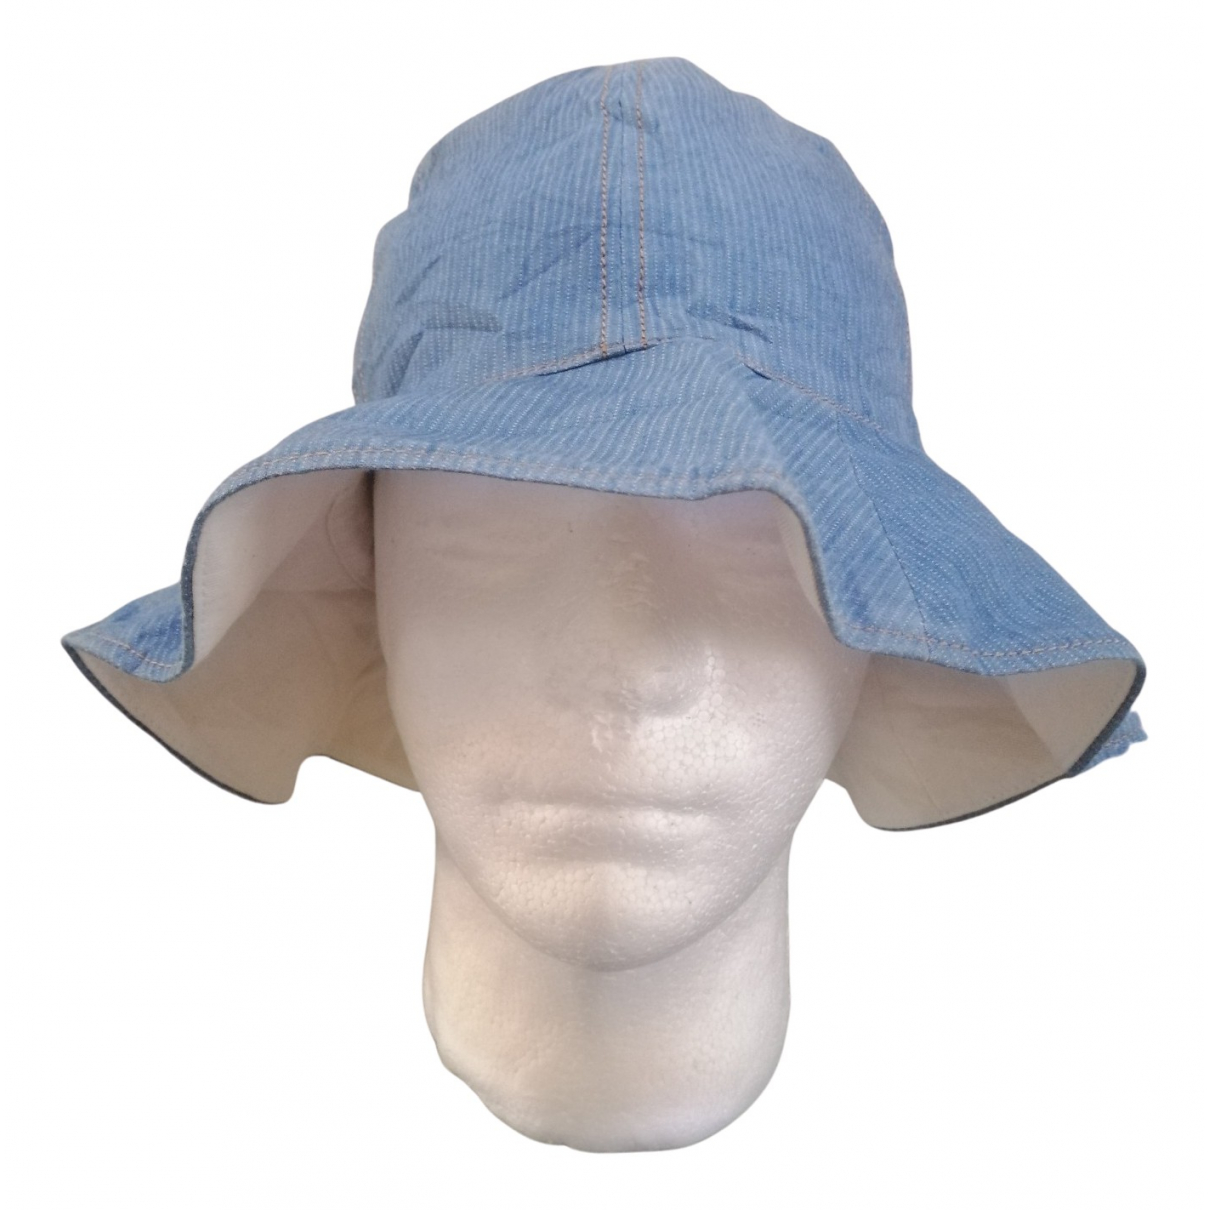 Issey Miyake N Blue Cotton hat for Women 57 cm